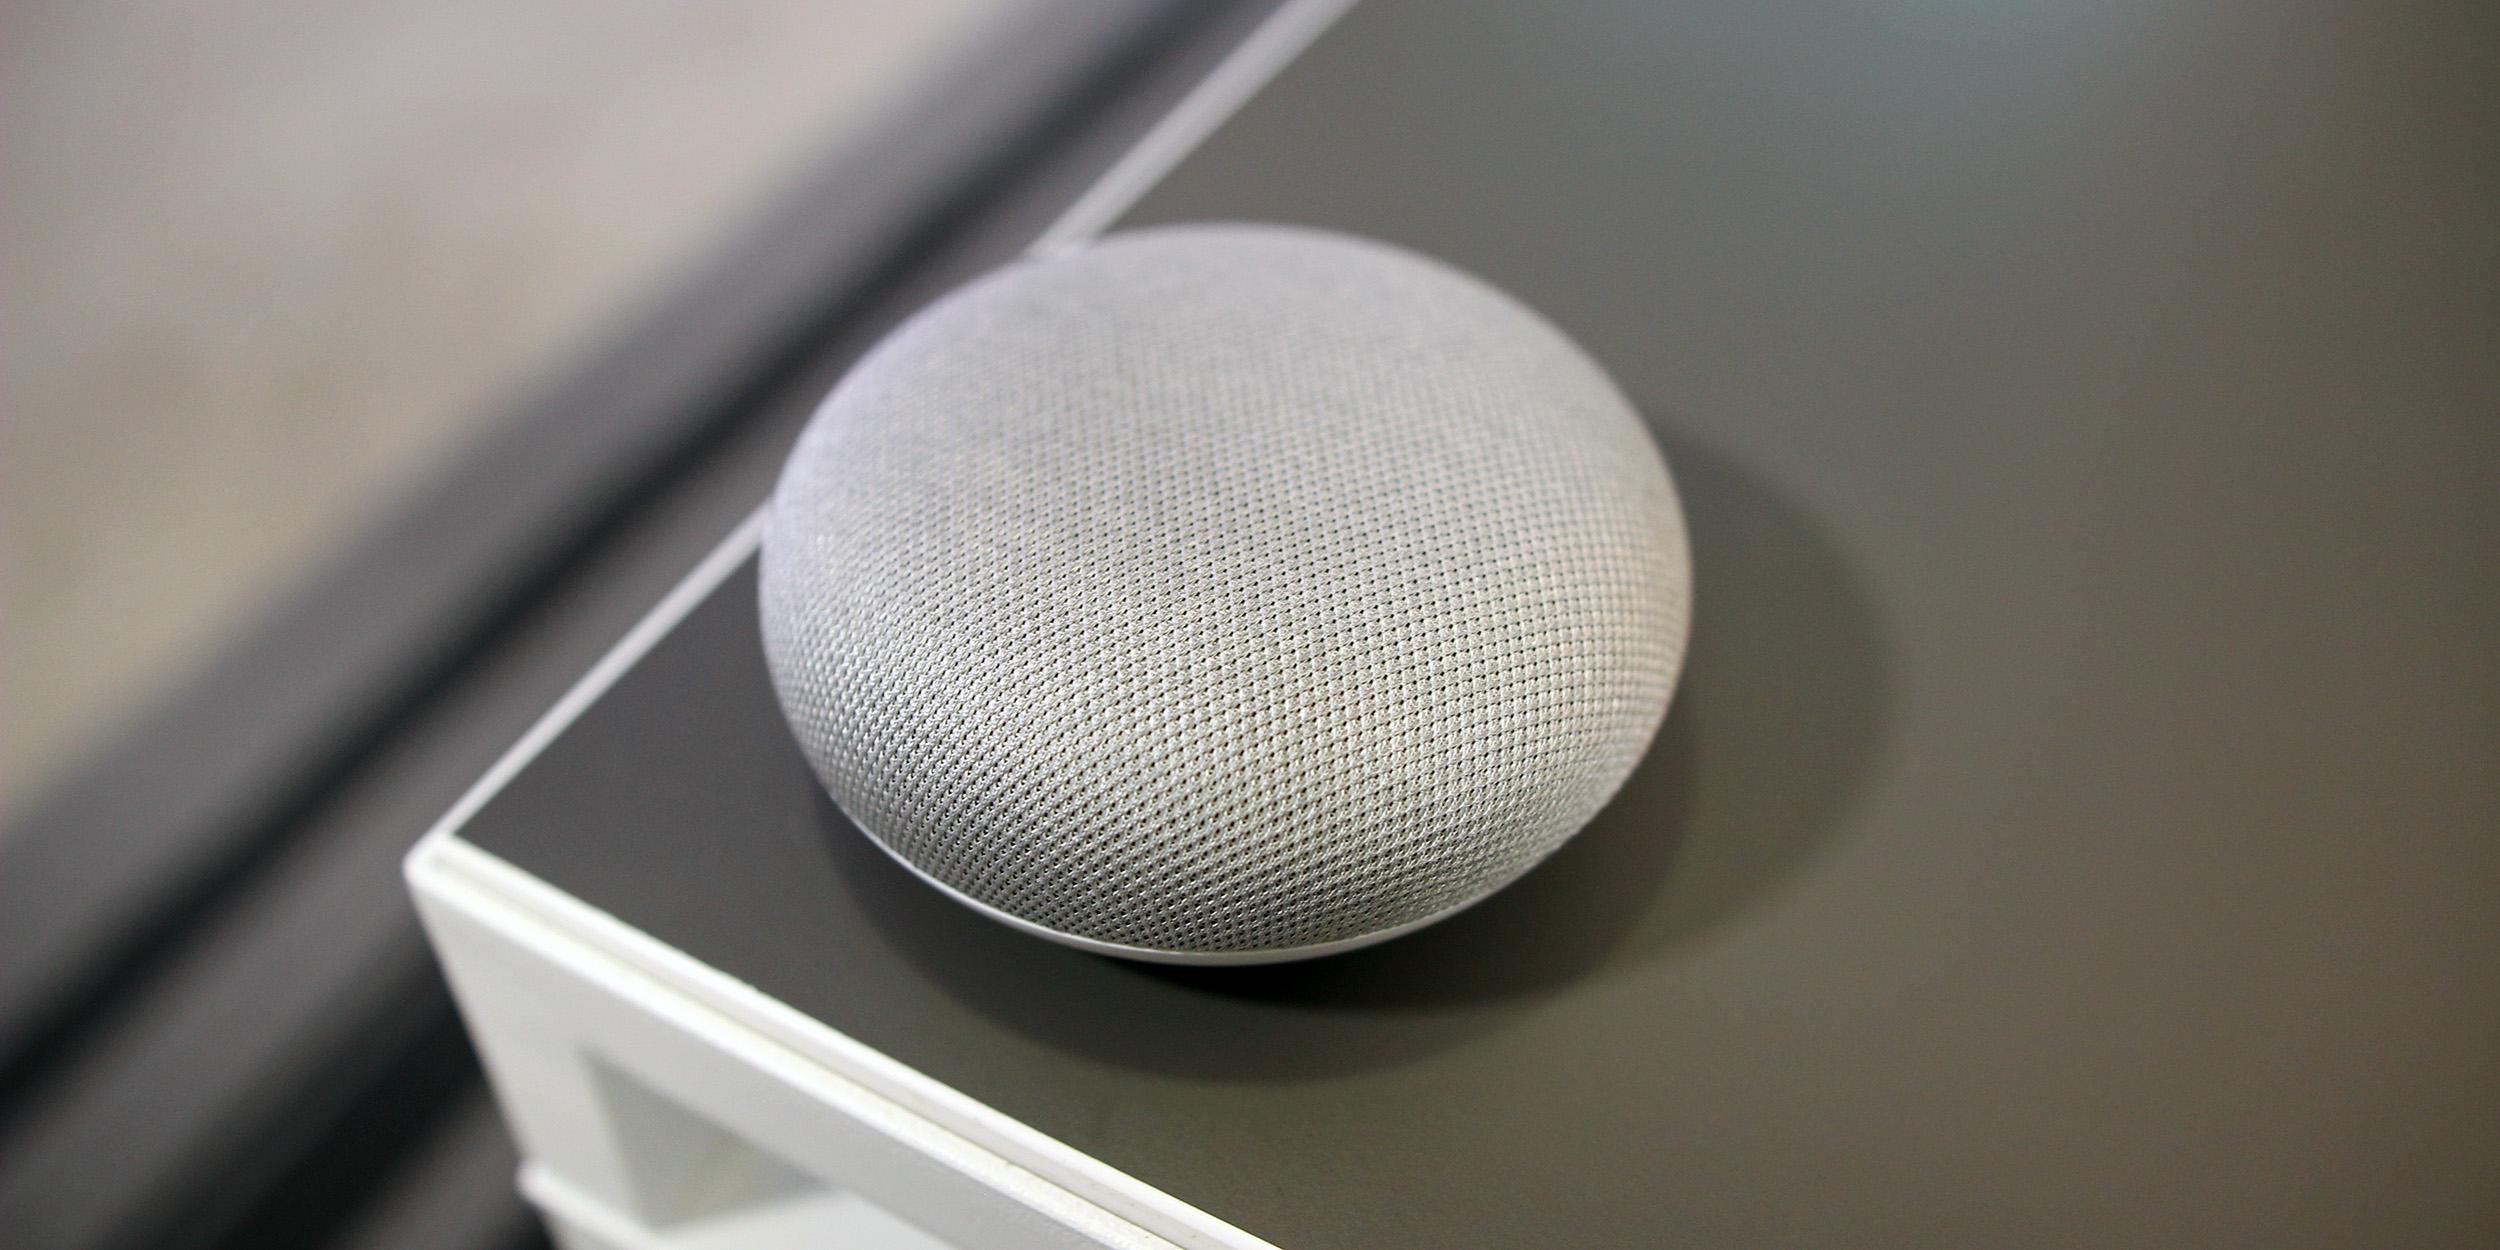 9to5Toys Last Call: Chromecast Ultra $55, Philips Hue White